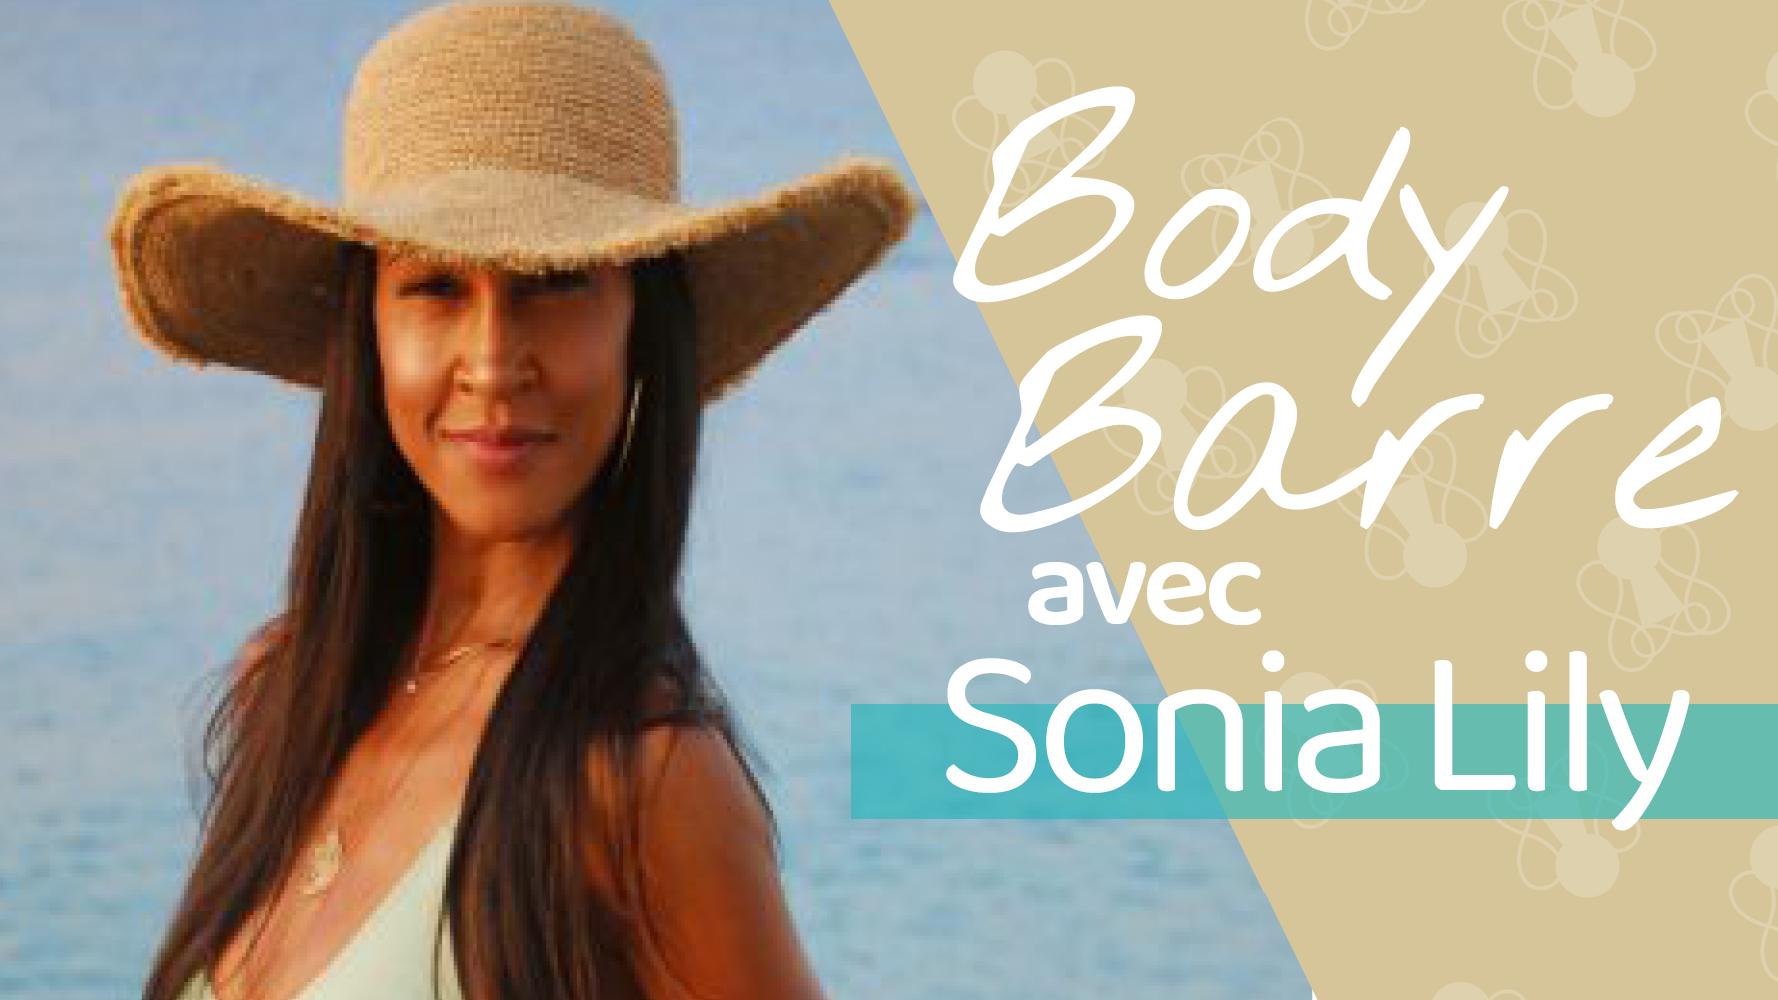 Sonia Lily, Body Barre coach à Nice